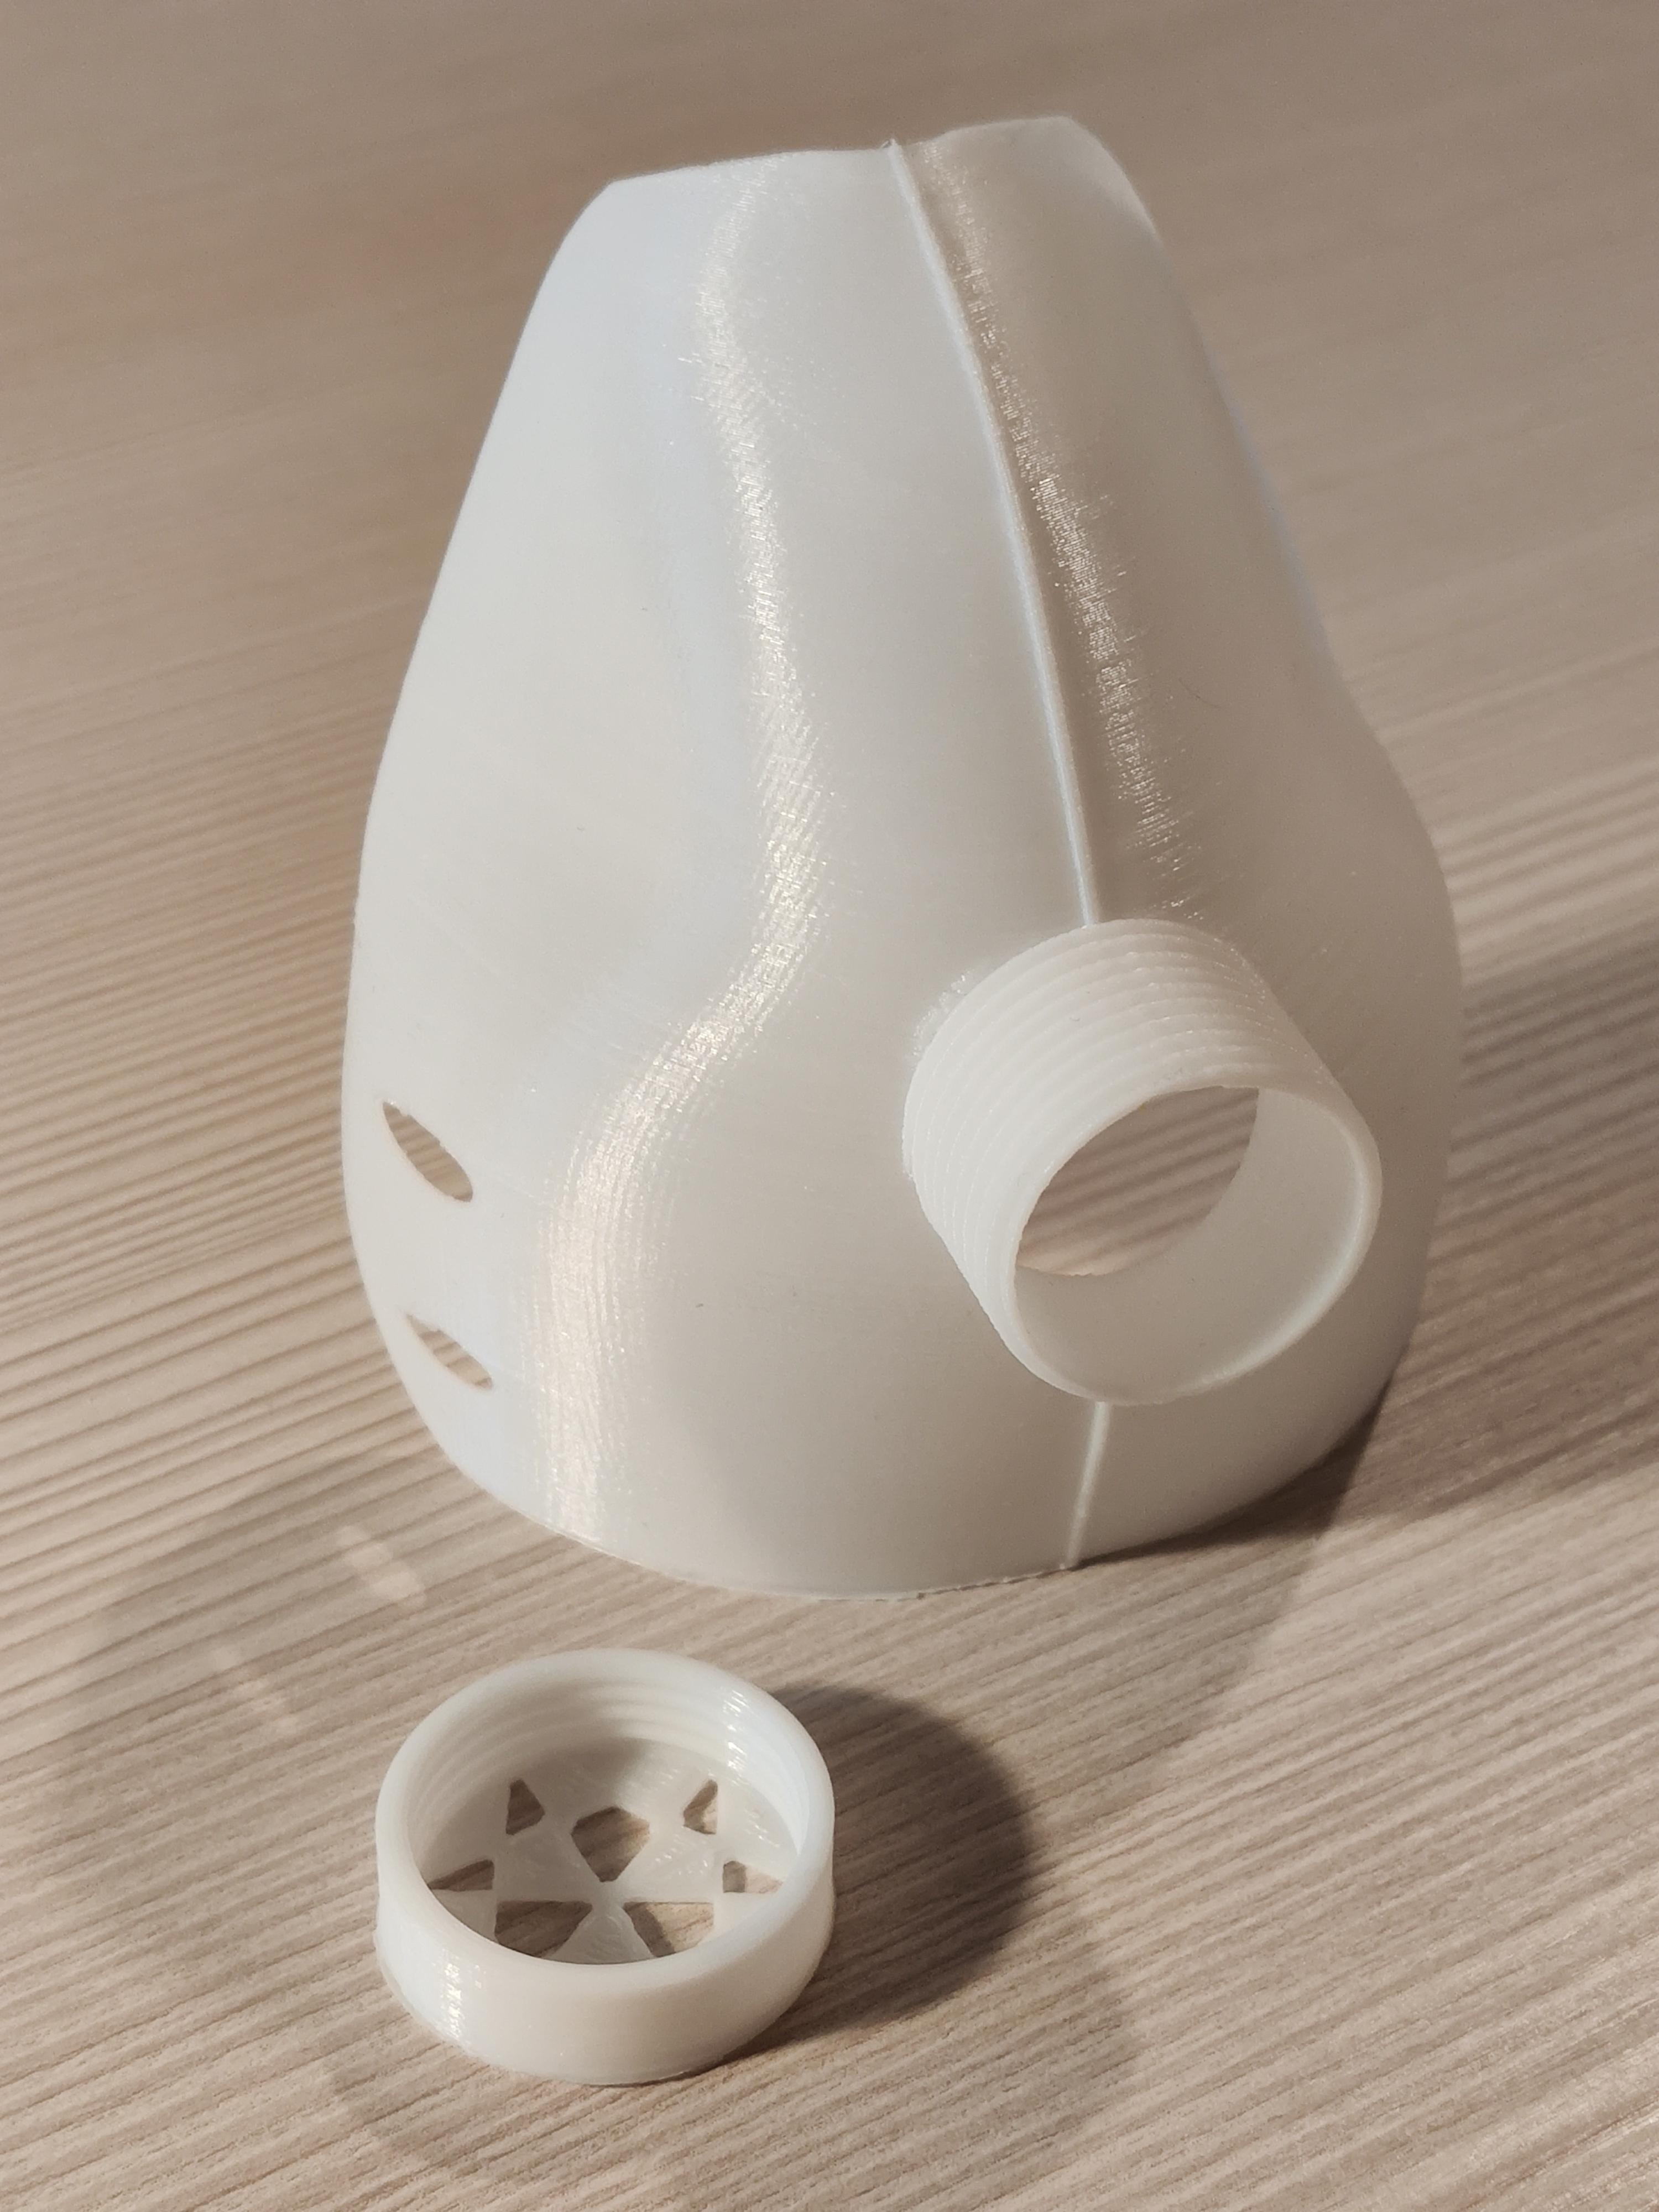 IMG_20200324_211138.jpg Download free STL file Mascherina-COVID-19 • 3D printable design, marcogenito